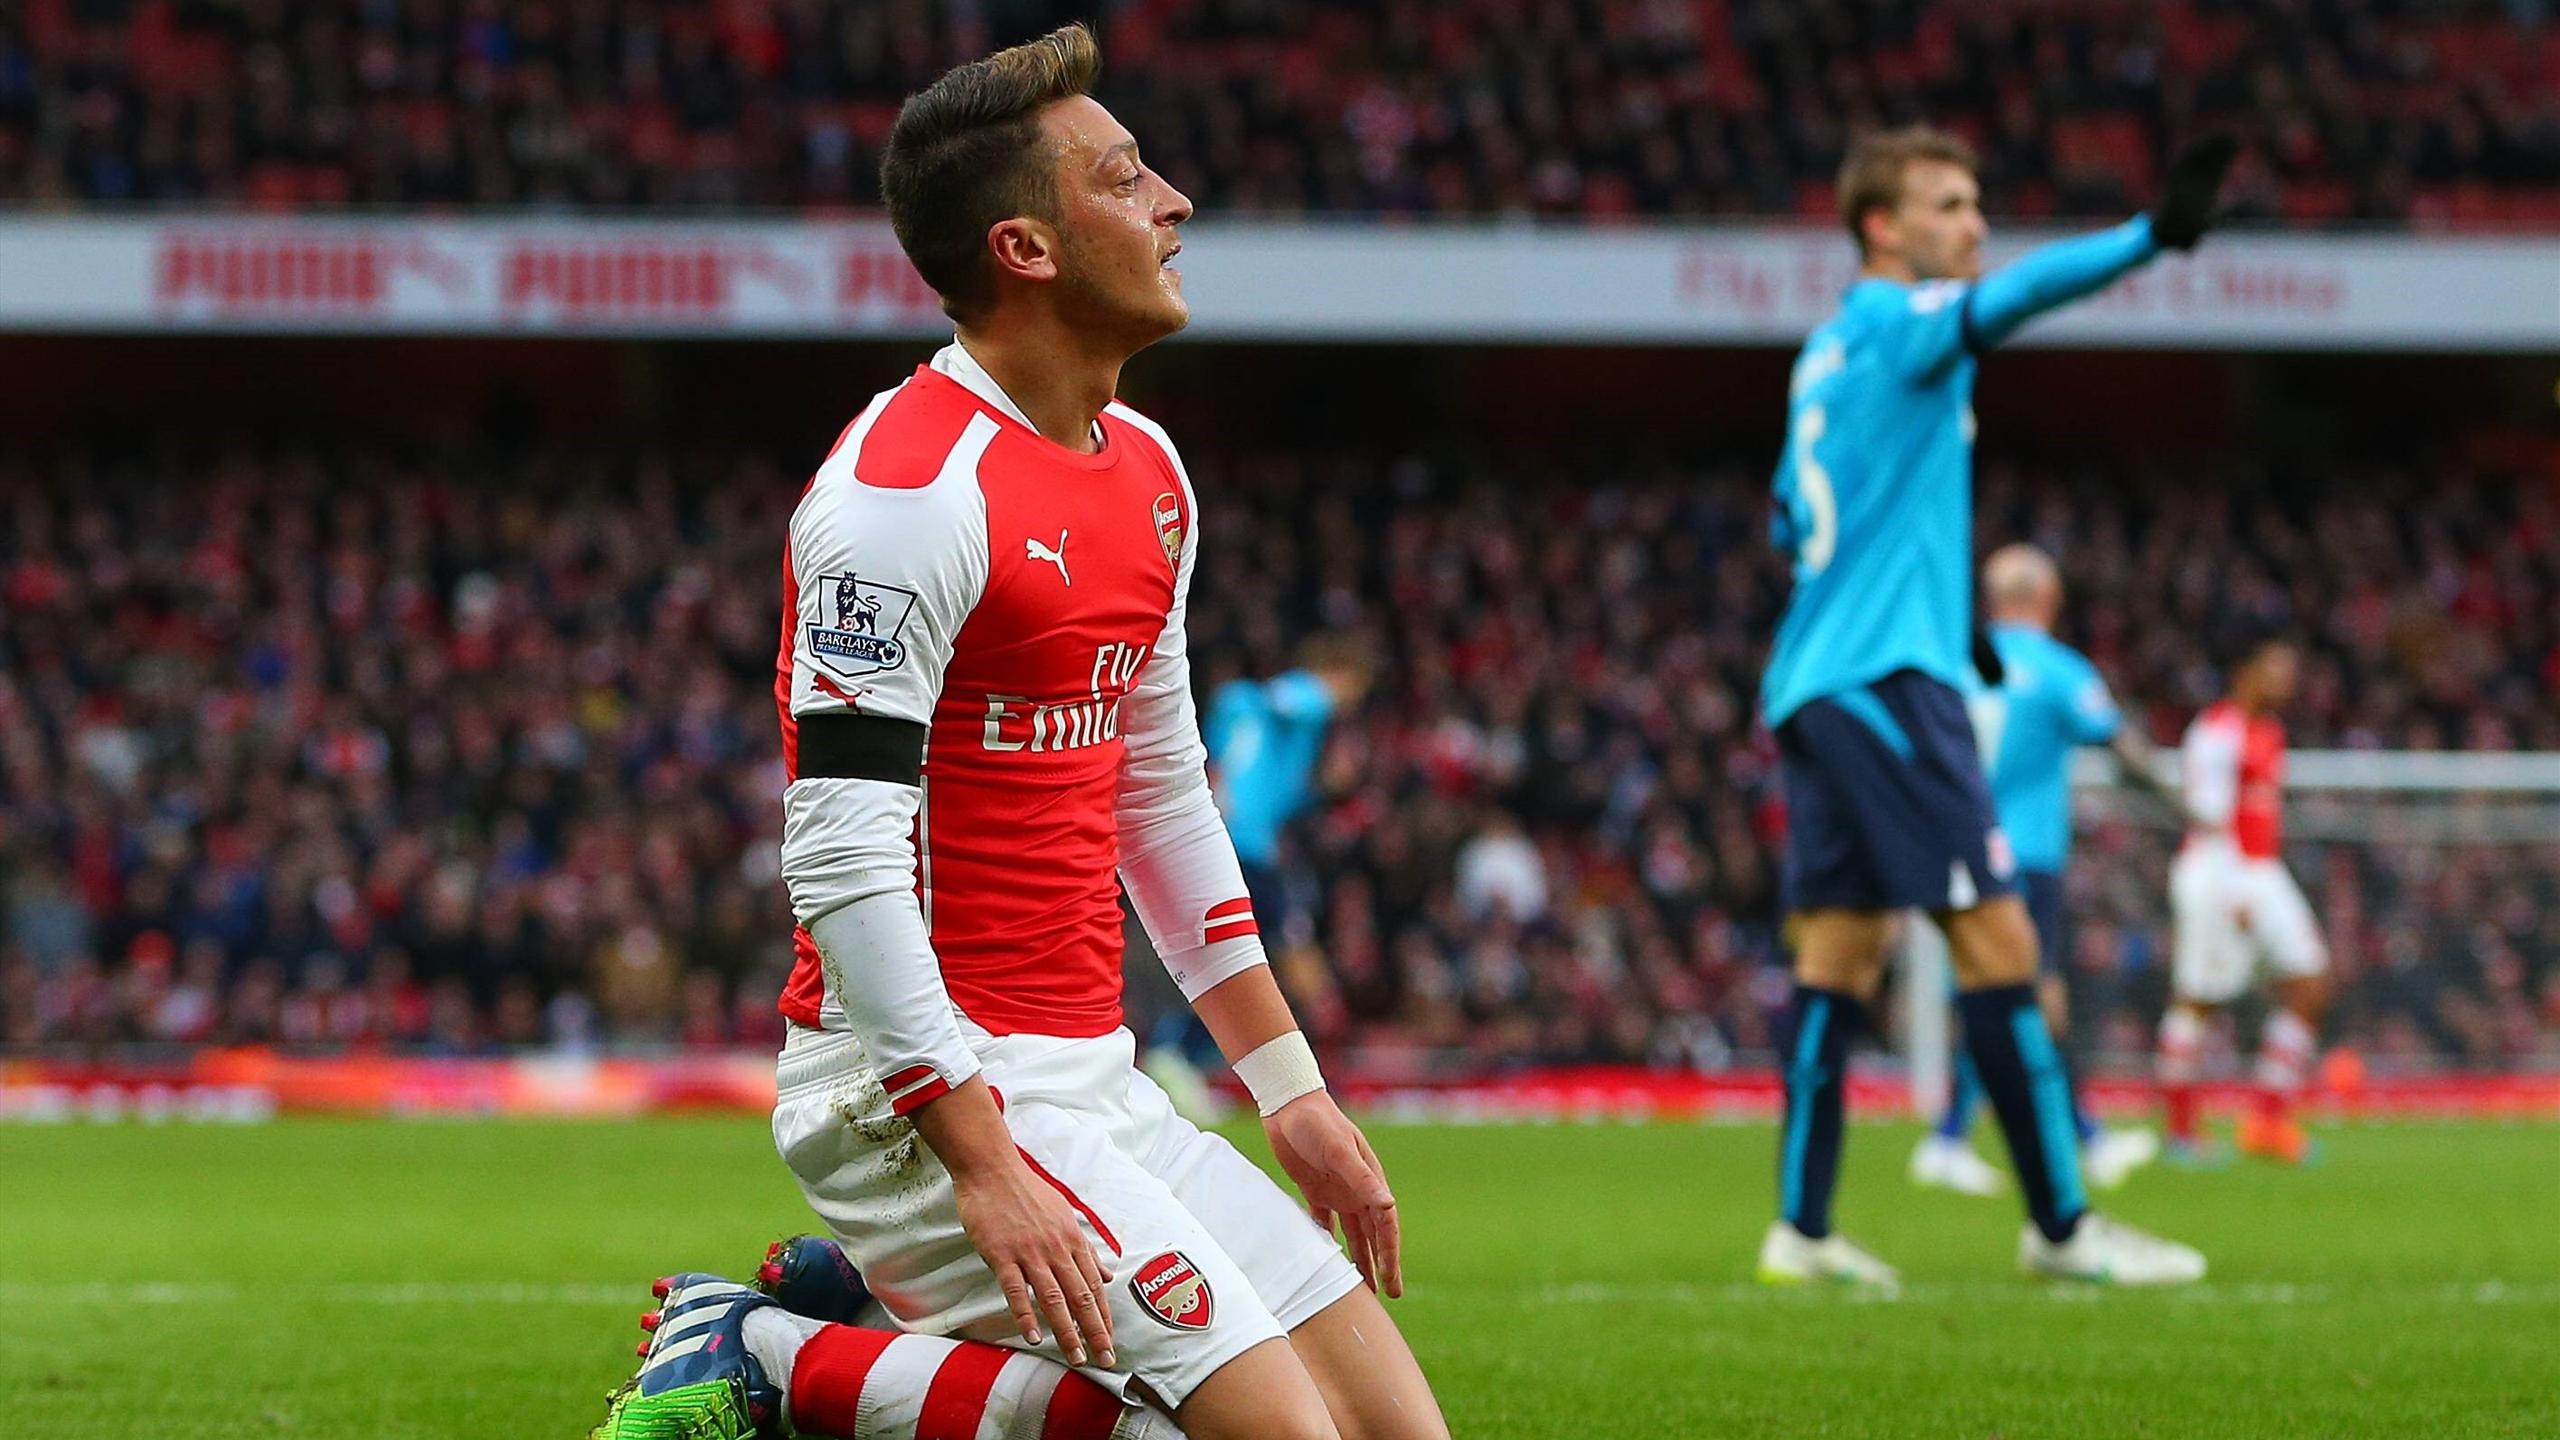 Mesut Özil sous le maillot d'Arsenal